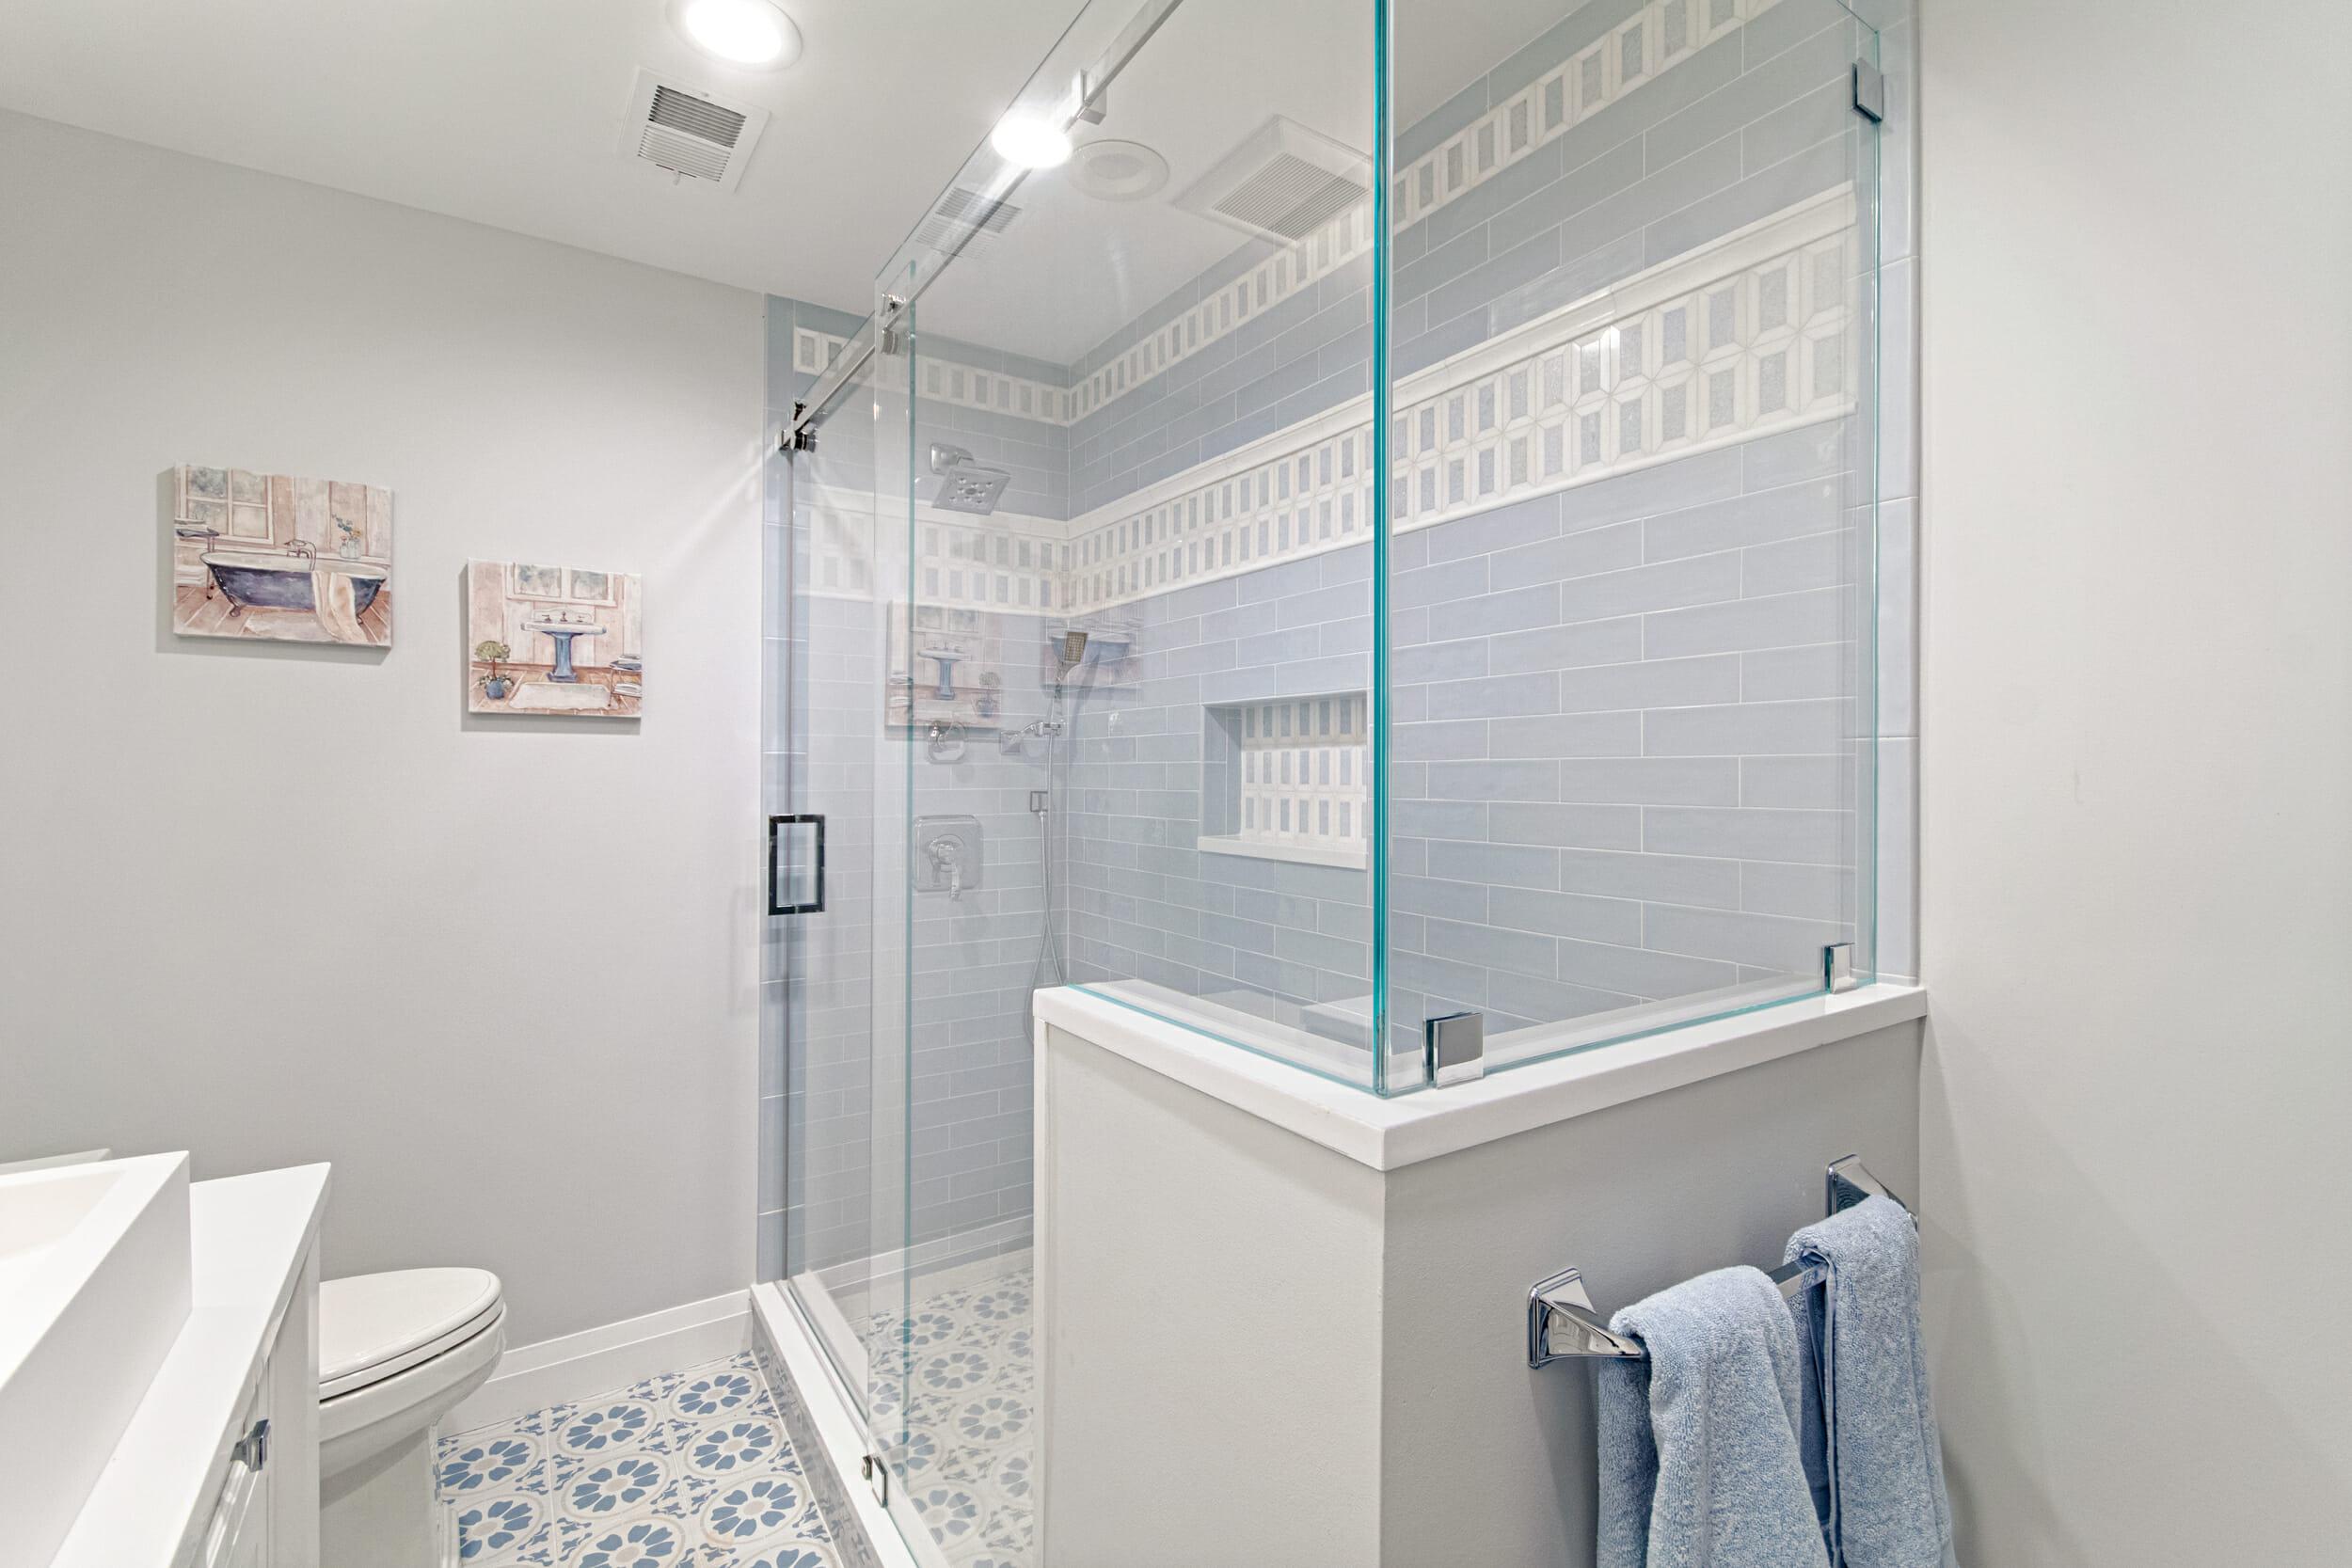 Verona Nj Bathroom Design Remodeling, Bathroom Remodel Nj